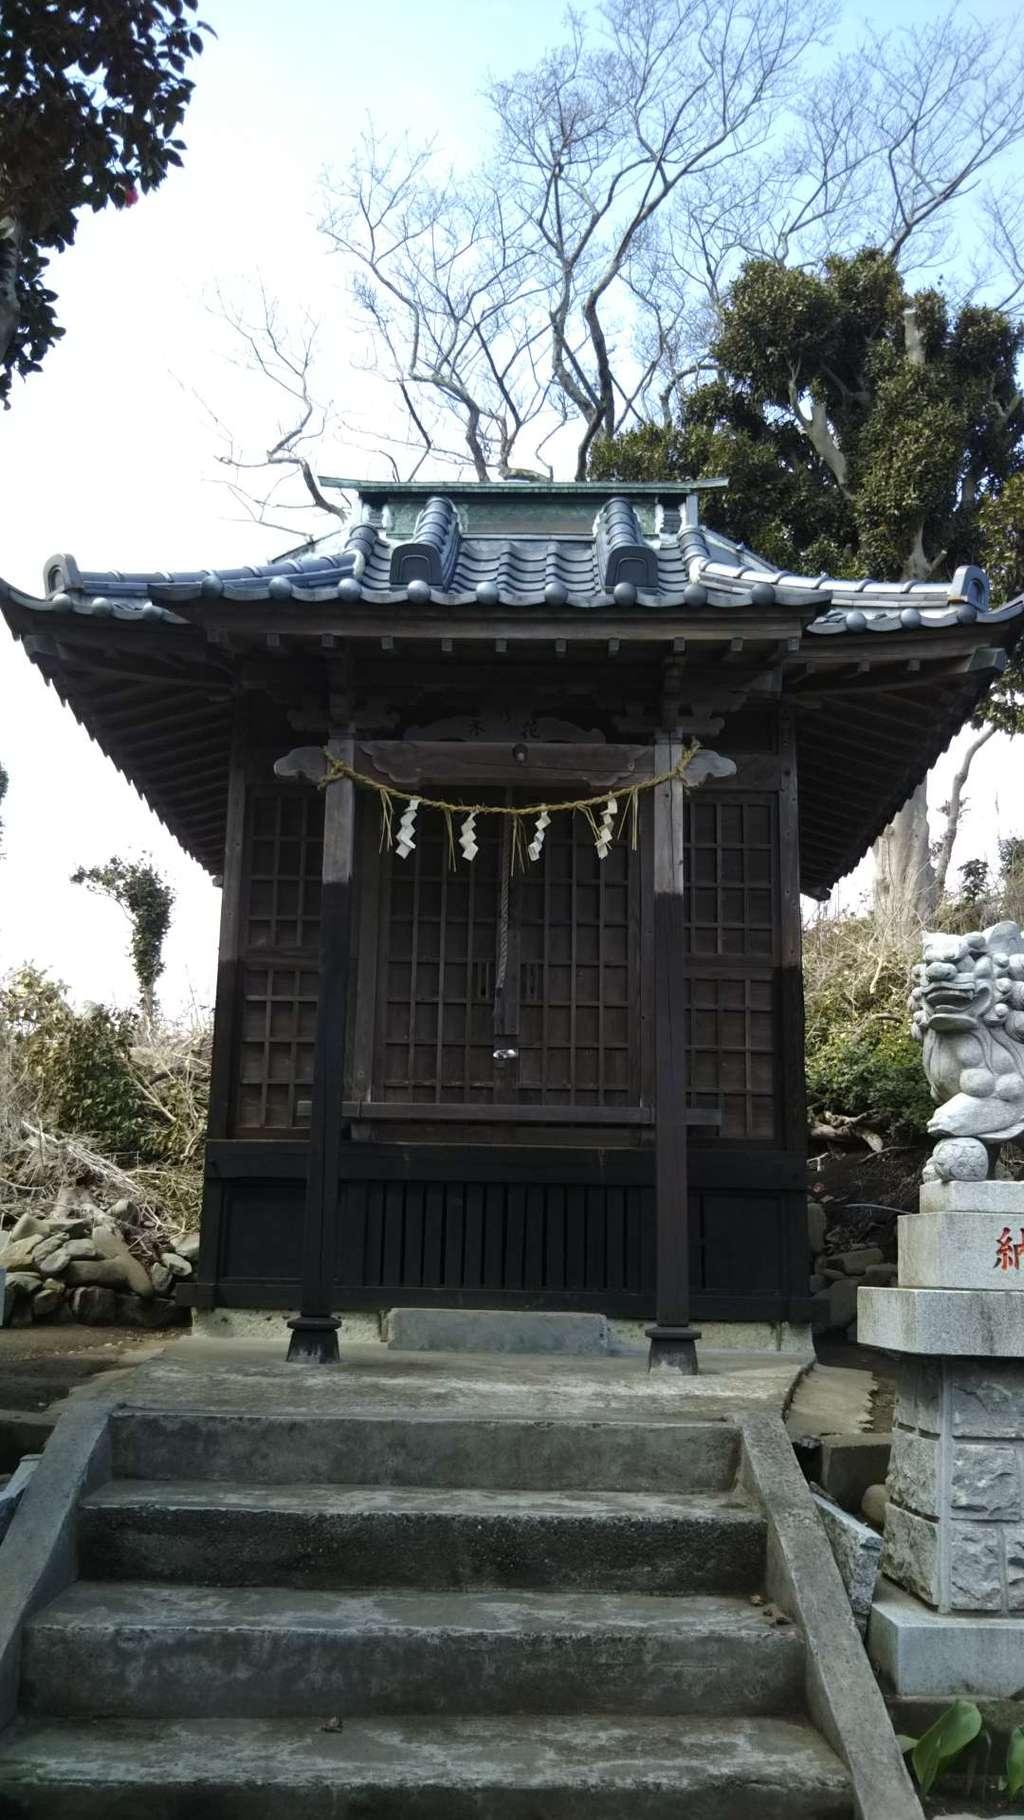 木花咲耶姫神社の本殿